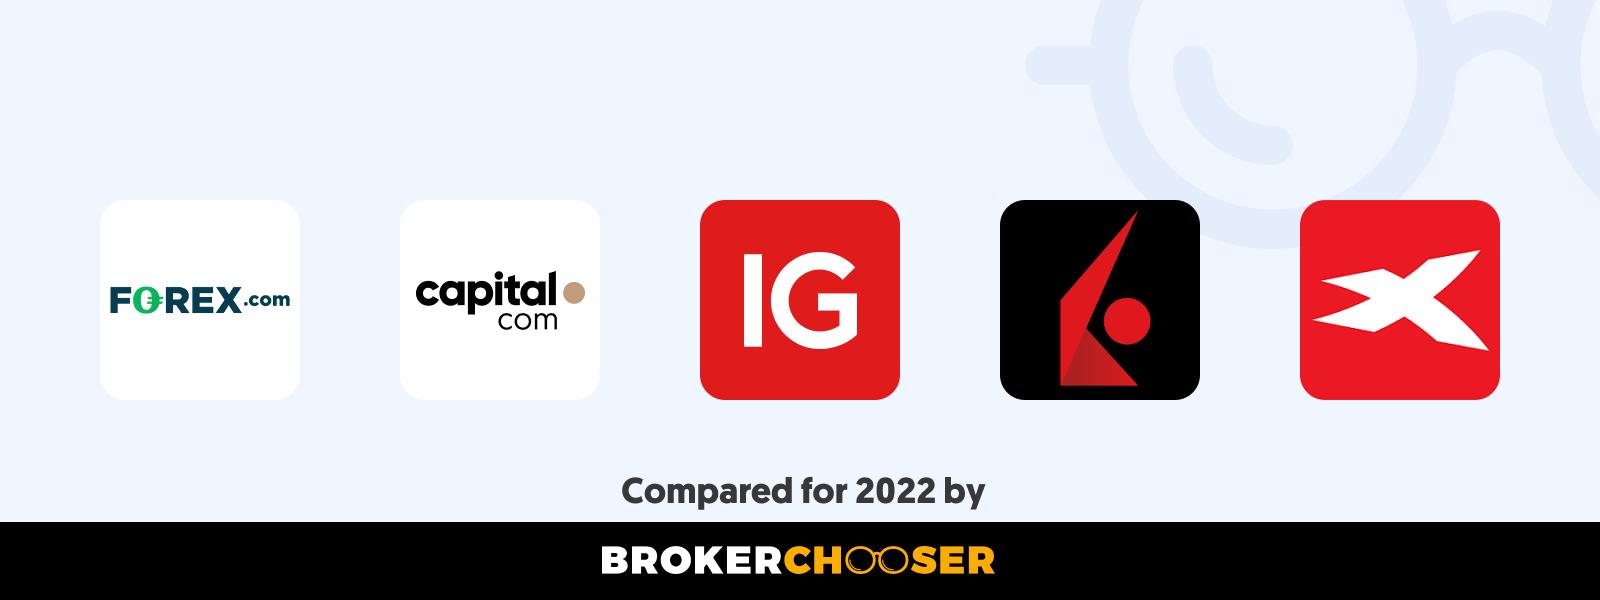 Best forex brokers for beginners in Togo in 2021